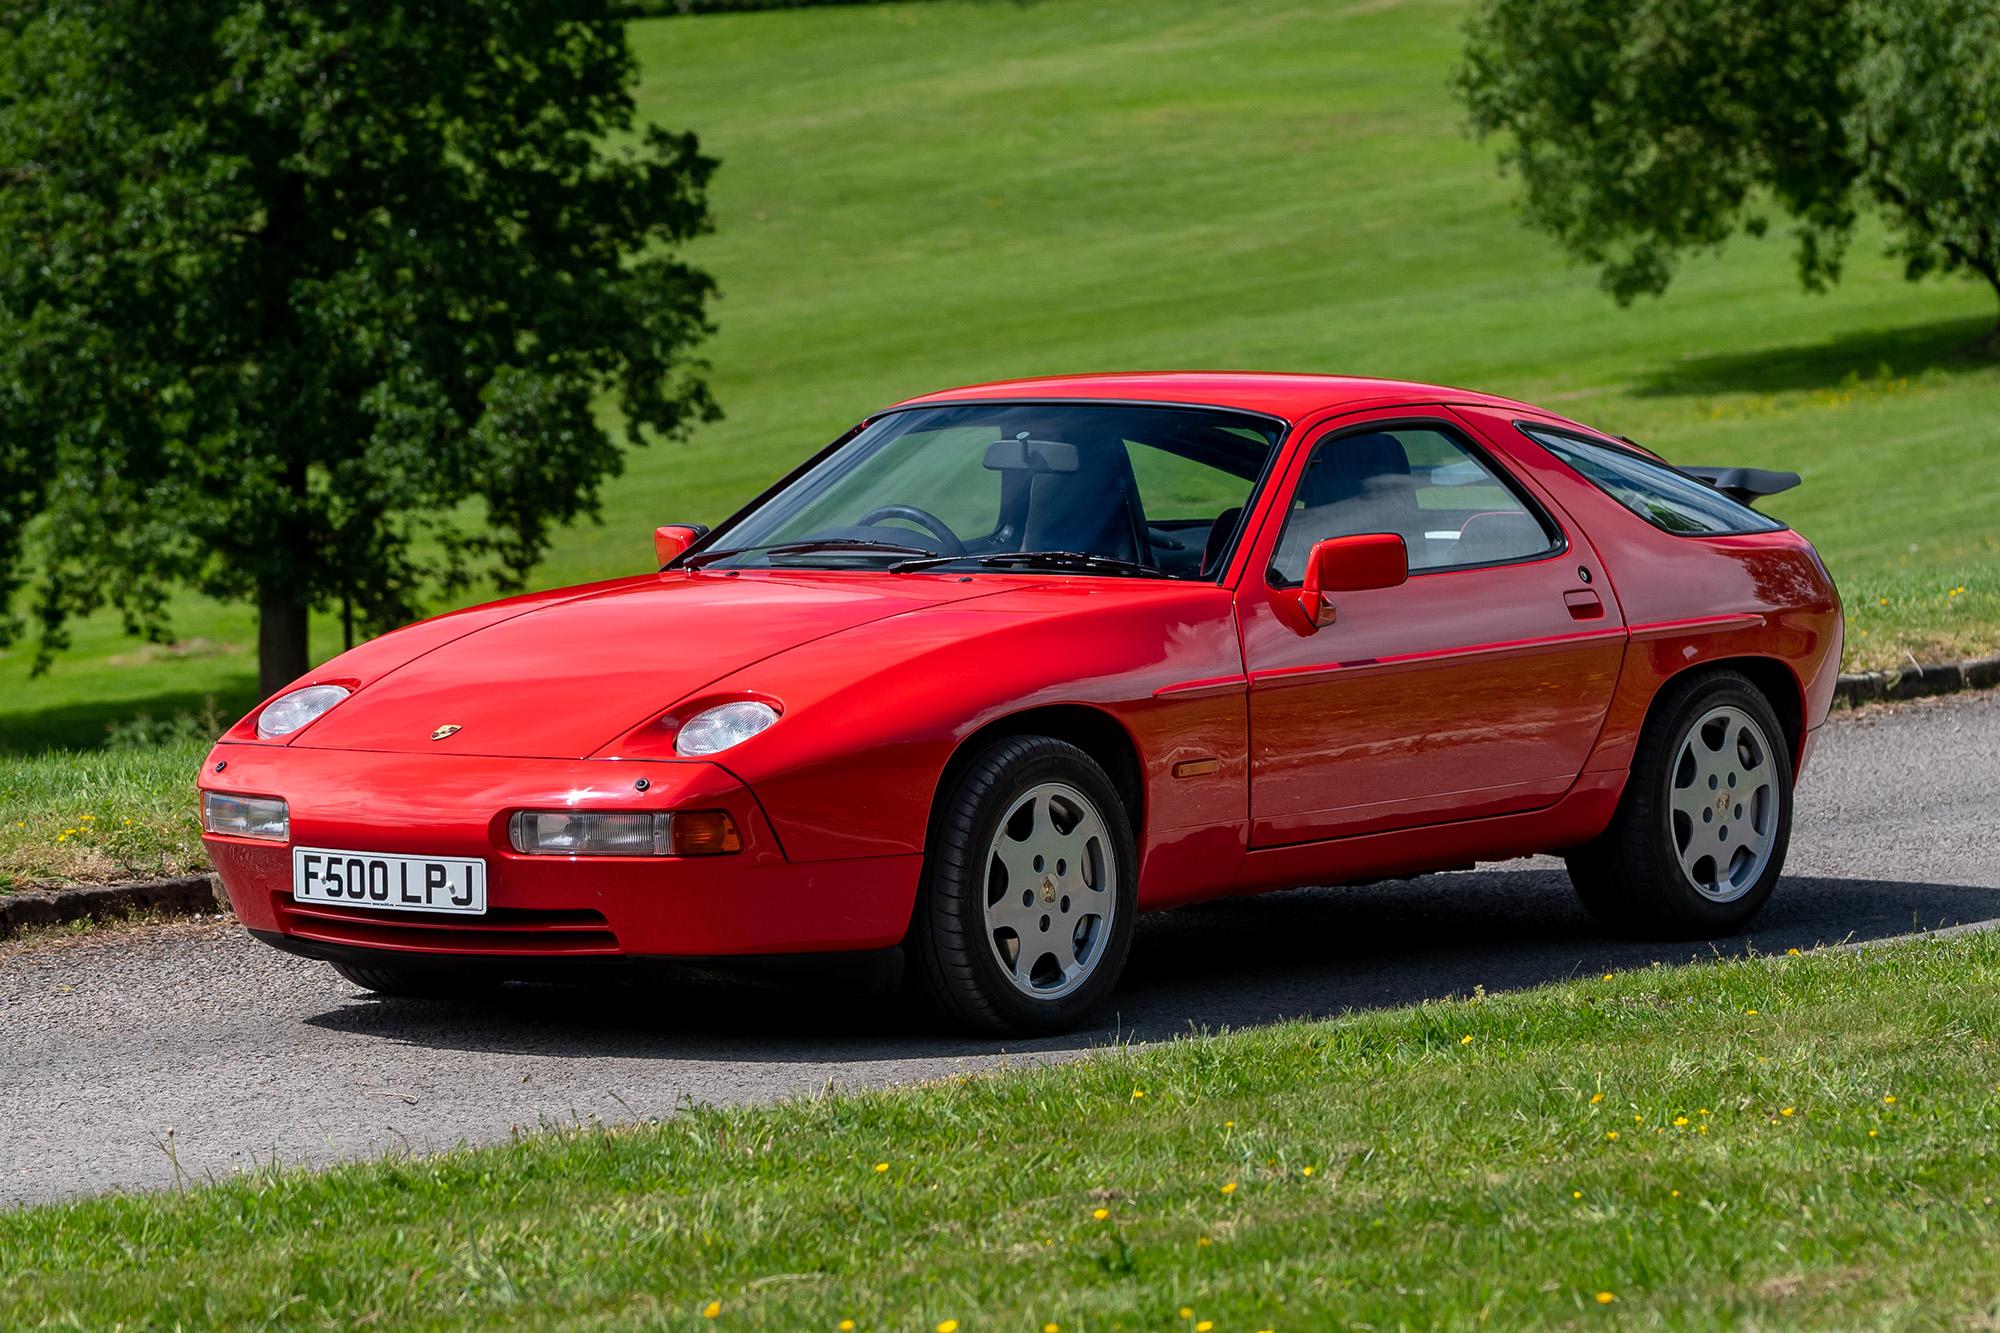 1988 PORSCHE 928 S4 SE - £25,000 SPENT 1,000 MILES AGO